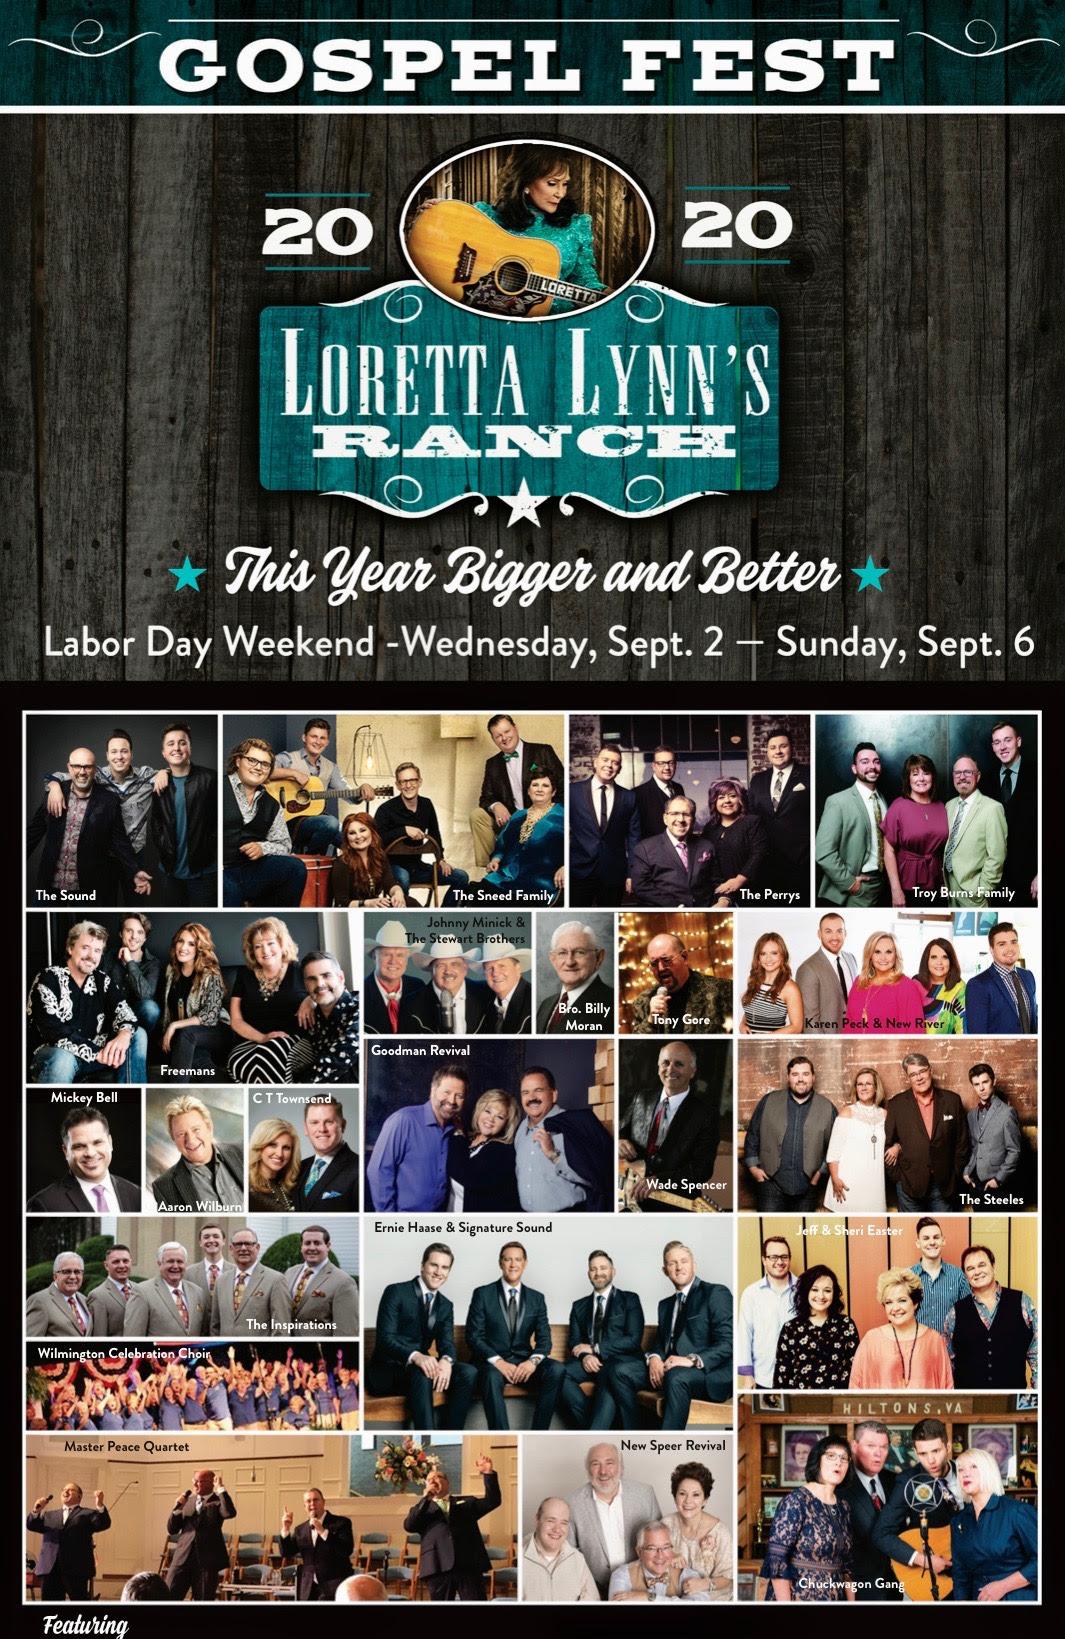 Gospel Music Festival at Loretta Lynn's Ranch Expands for 2020 Labor Day Weekend September 2 - September 6, 2020